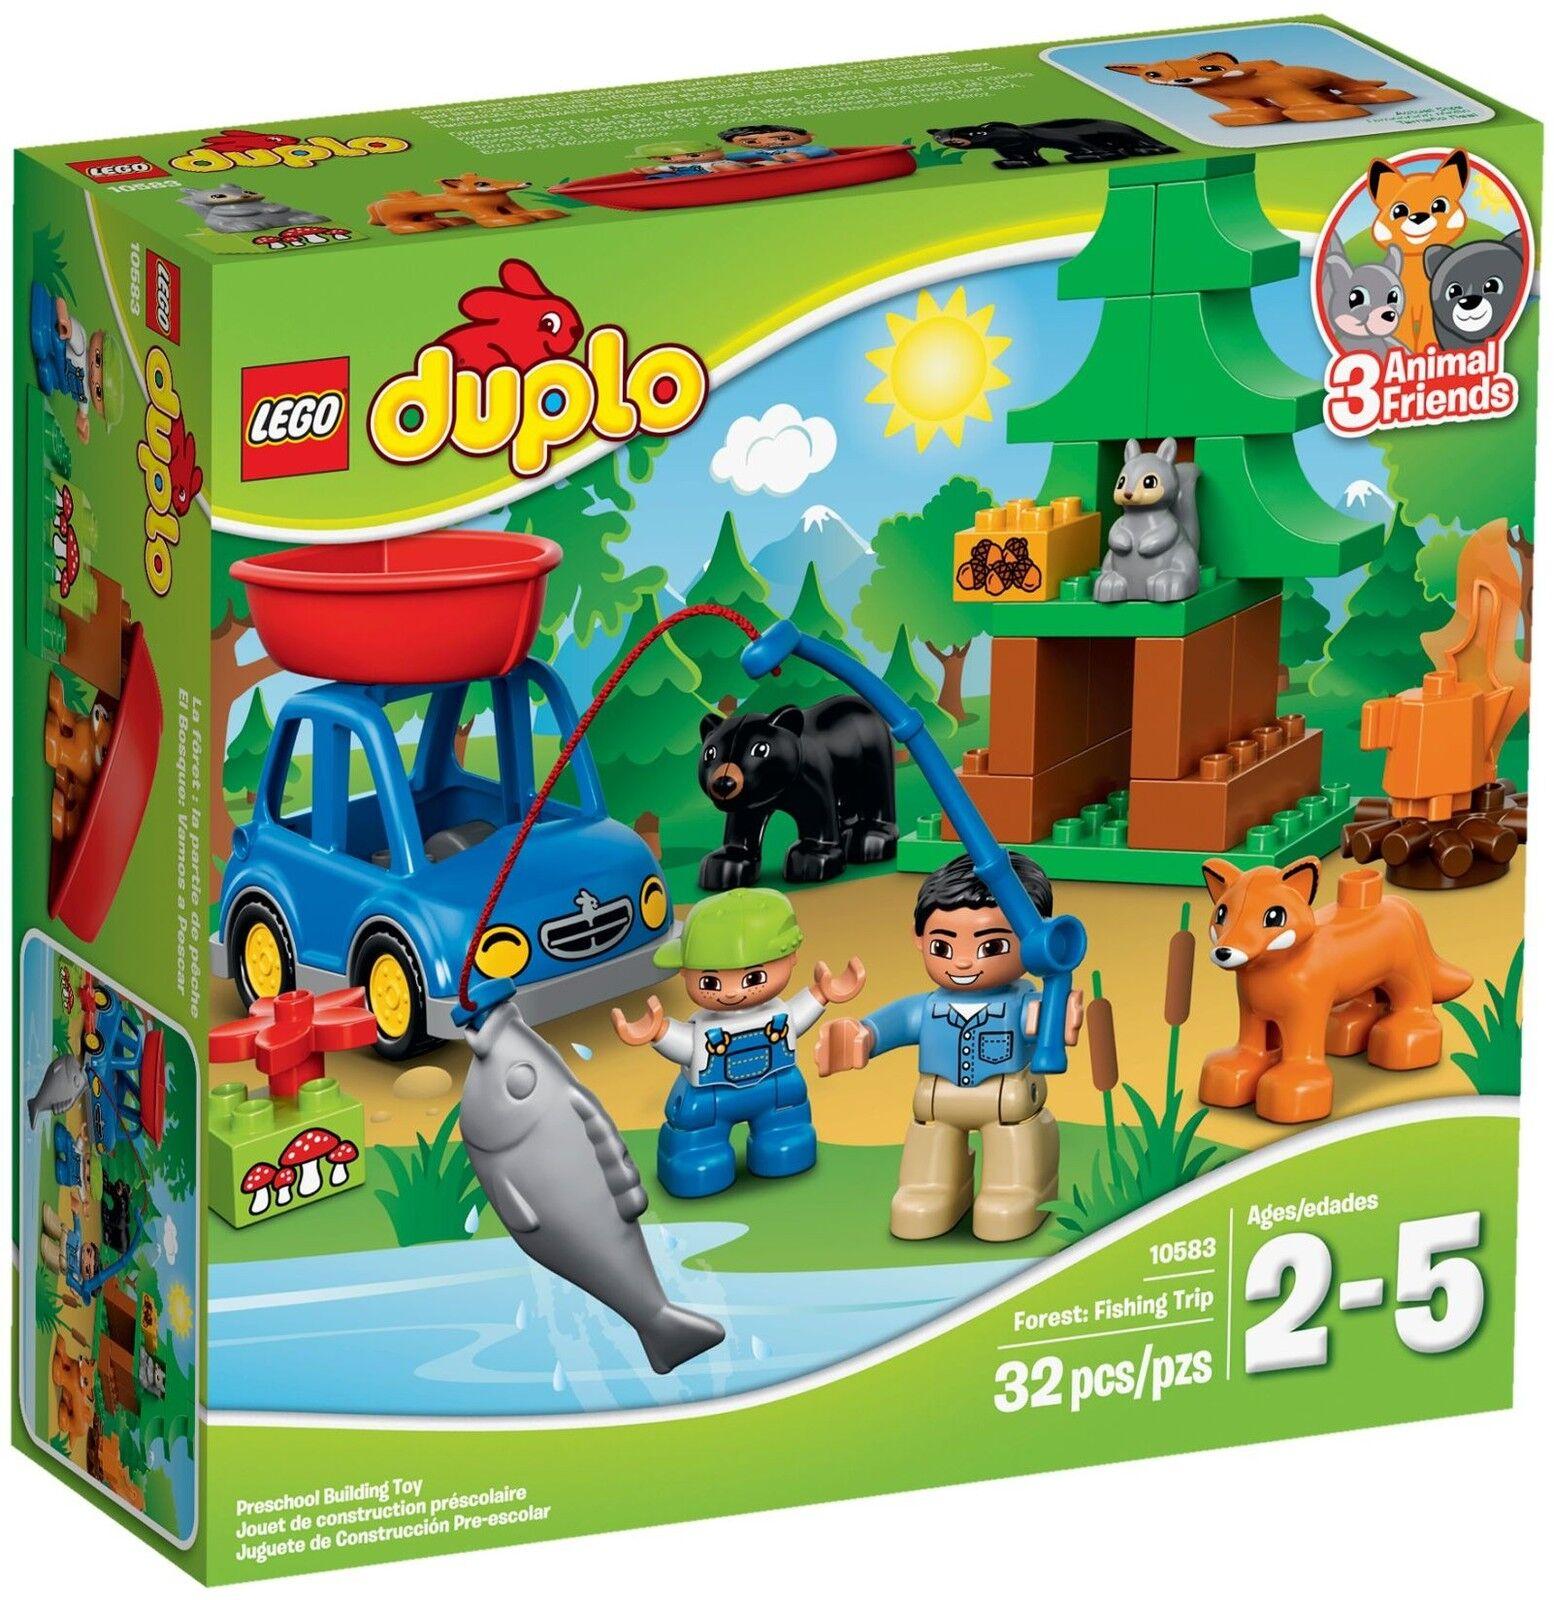 LEGO ® DUPLO ® 10583 Angel gita NUOVO OVP _ Forest: Fishing Trip NEW MISB NRFB